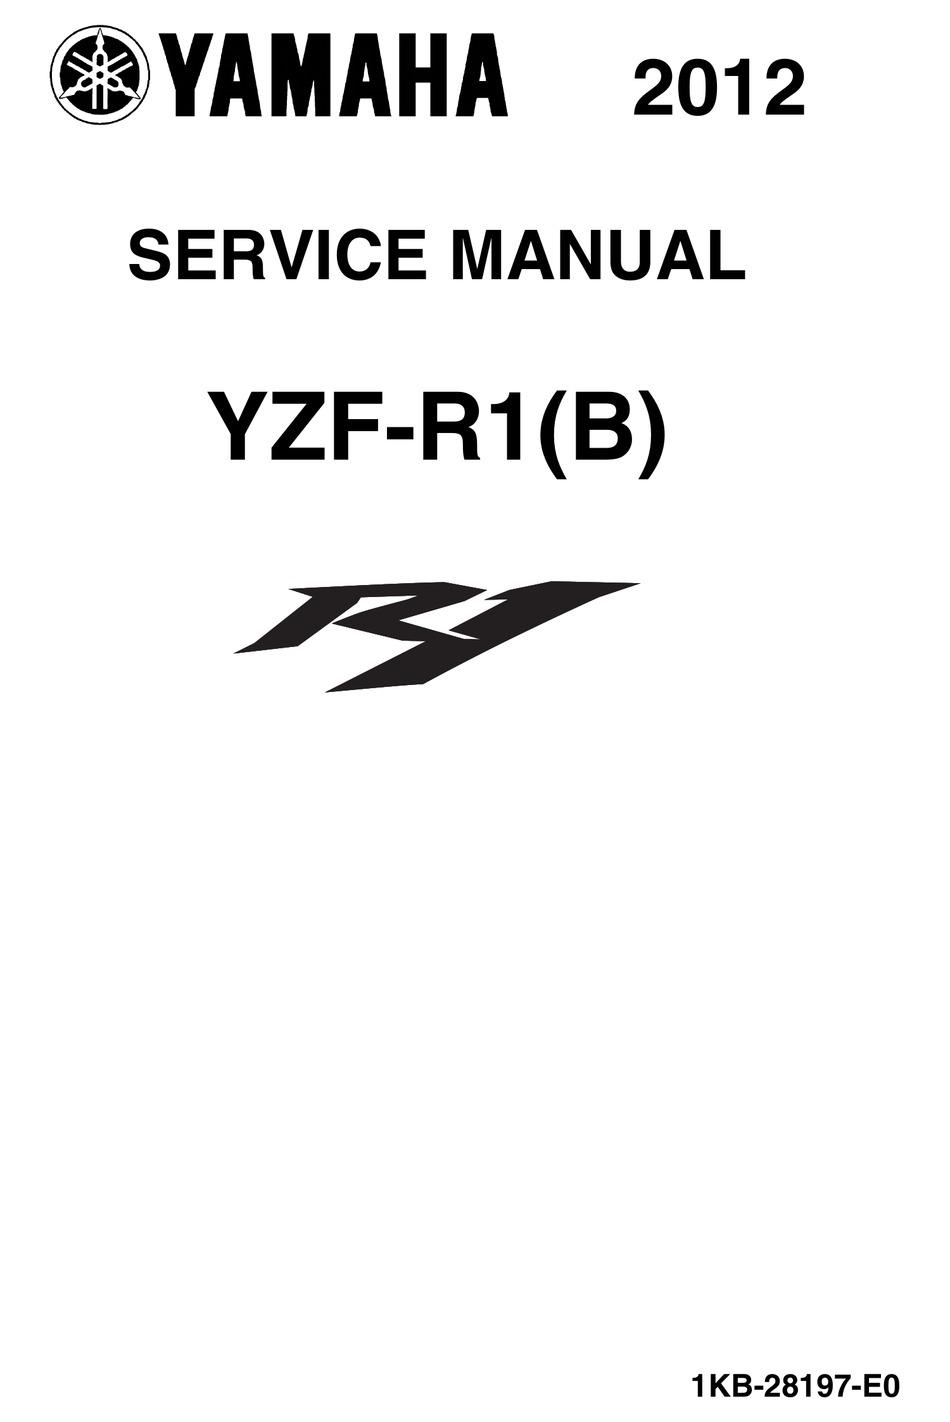 yamaha yzf-r1(b) 2012 service manual pdf download | manualslib  manualslib